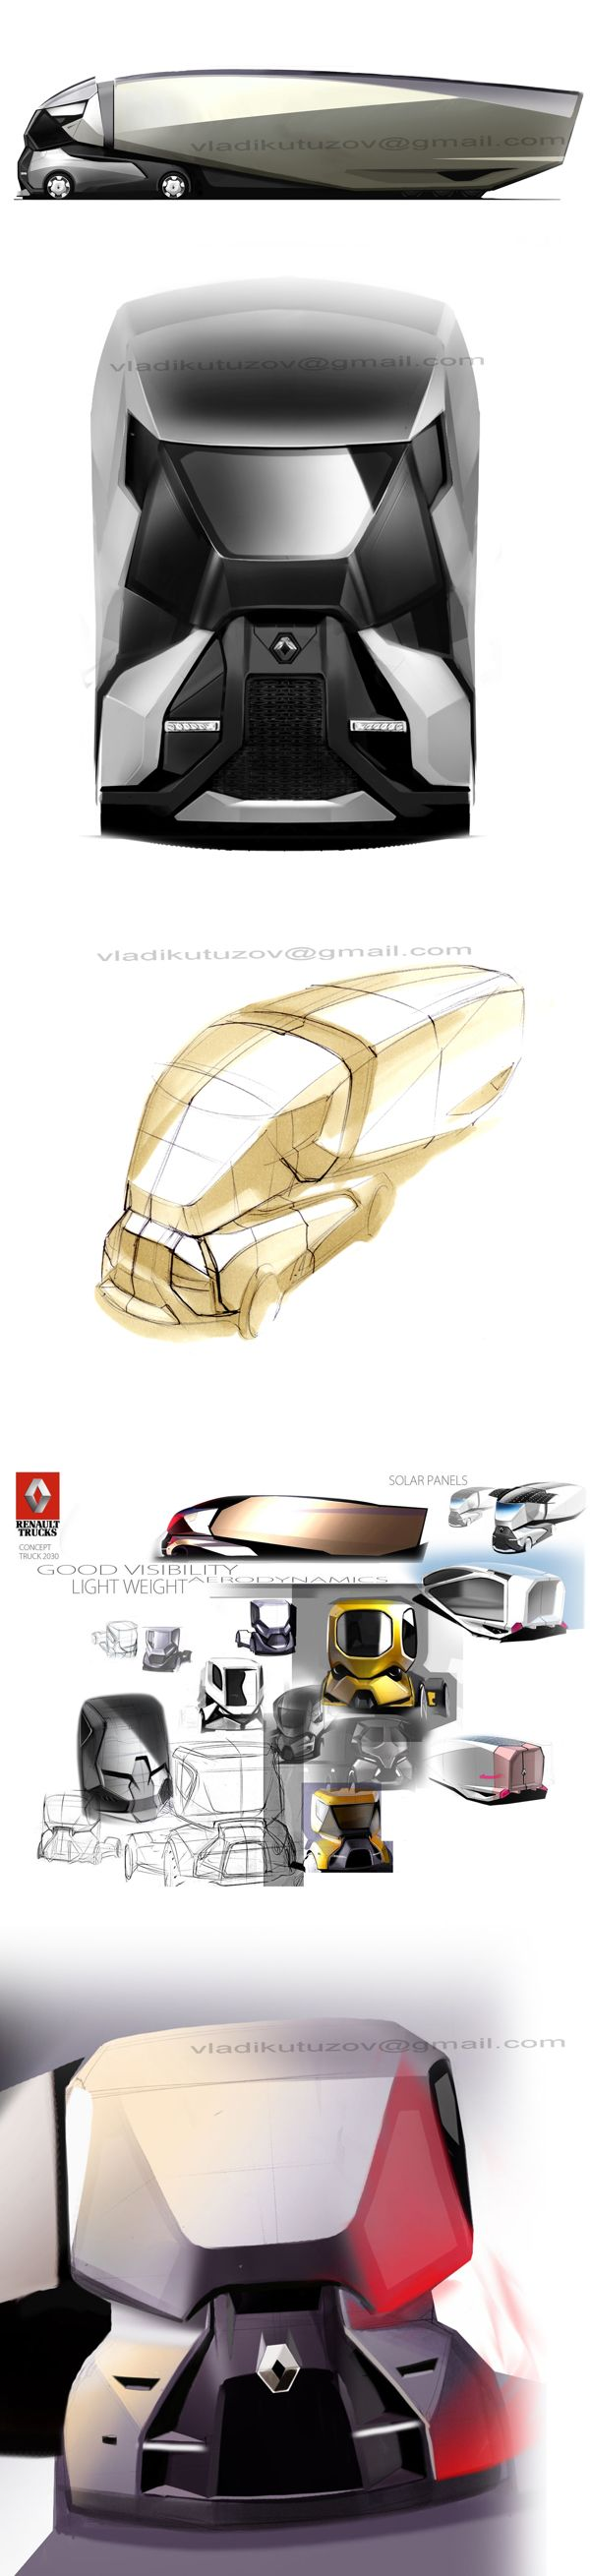 concept TRUCK by vladimir kutuzov, via Behance